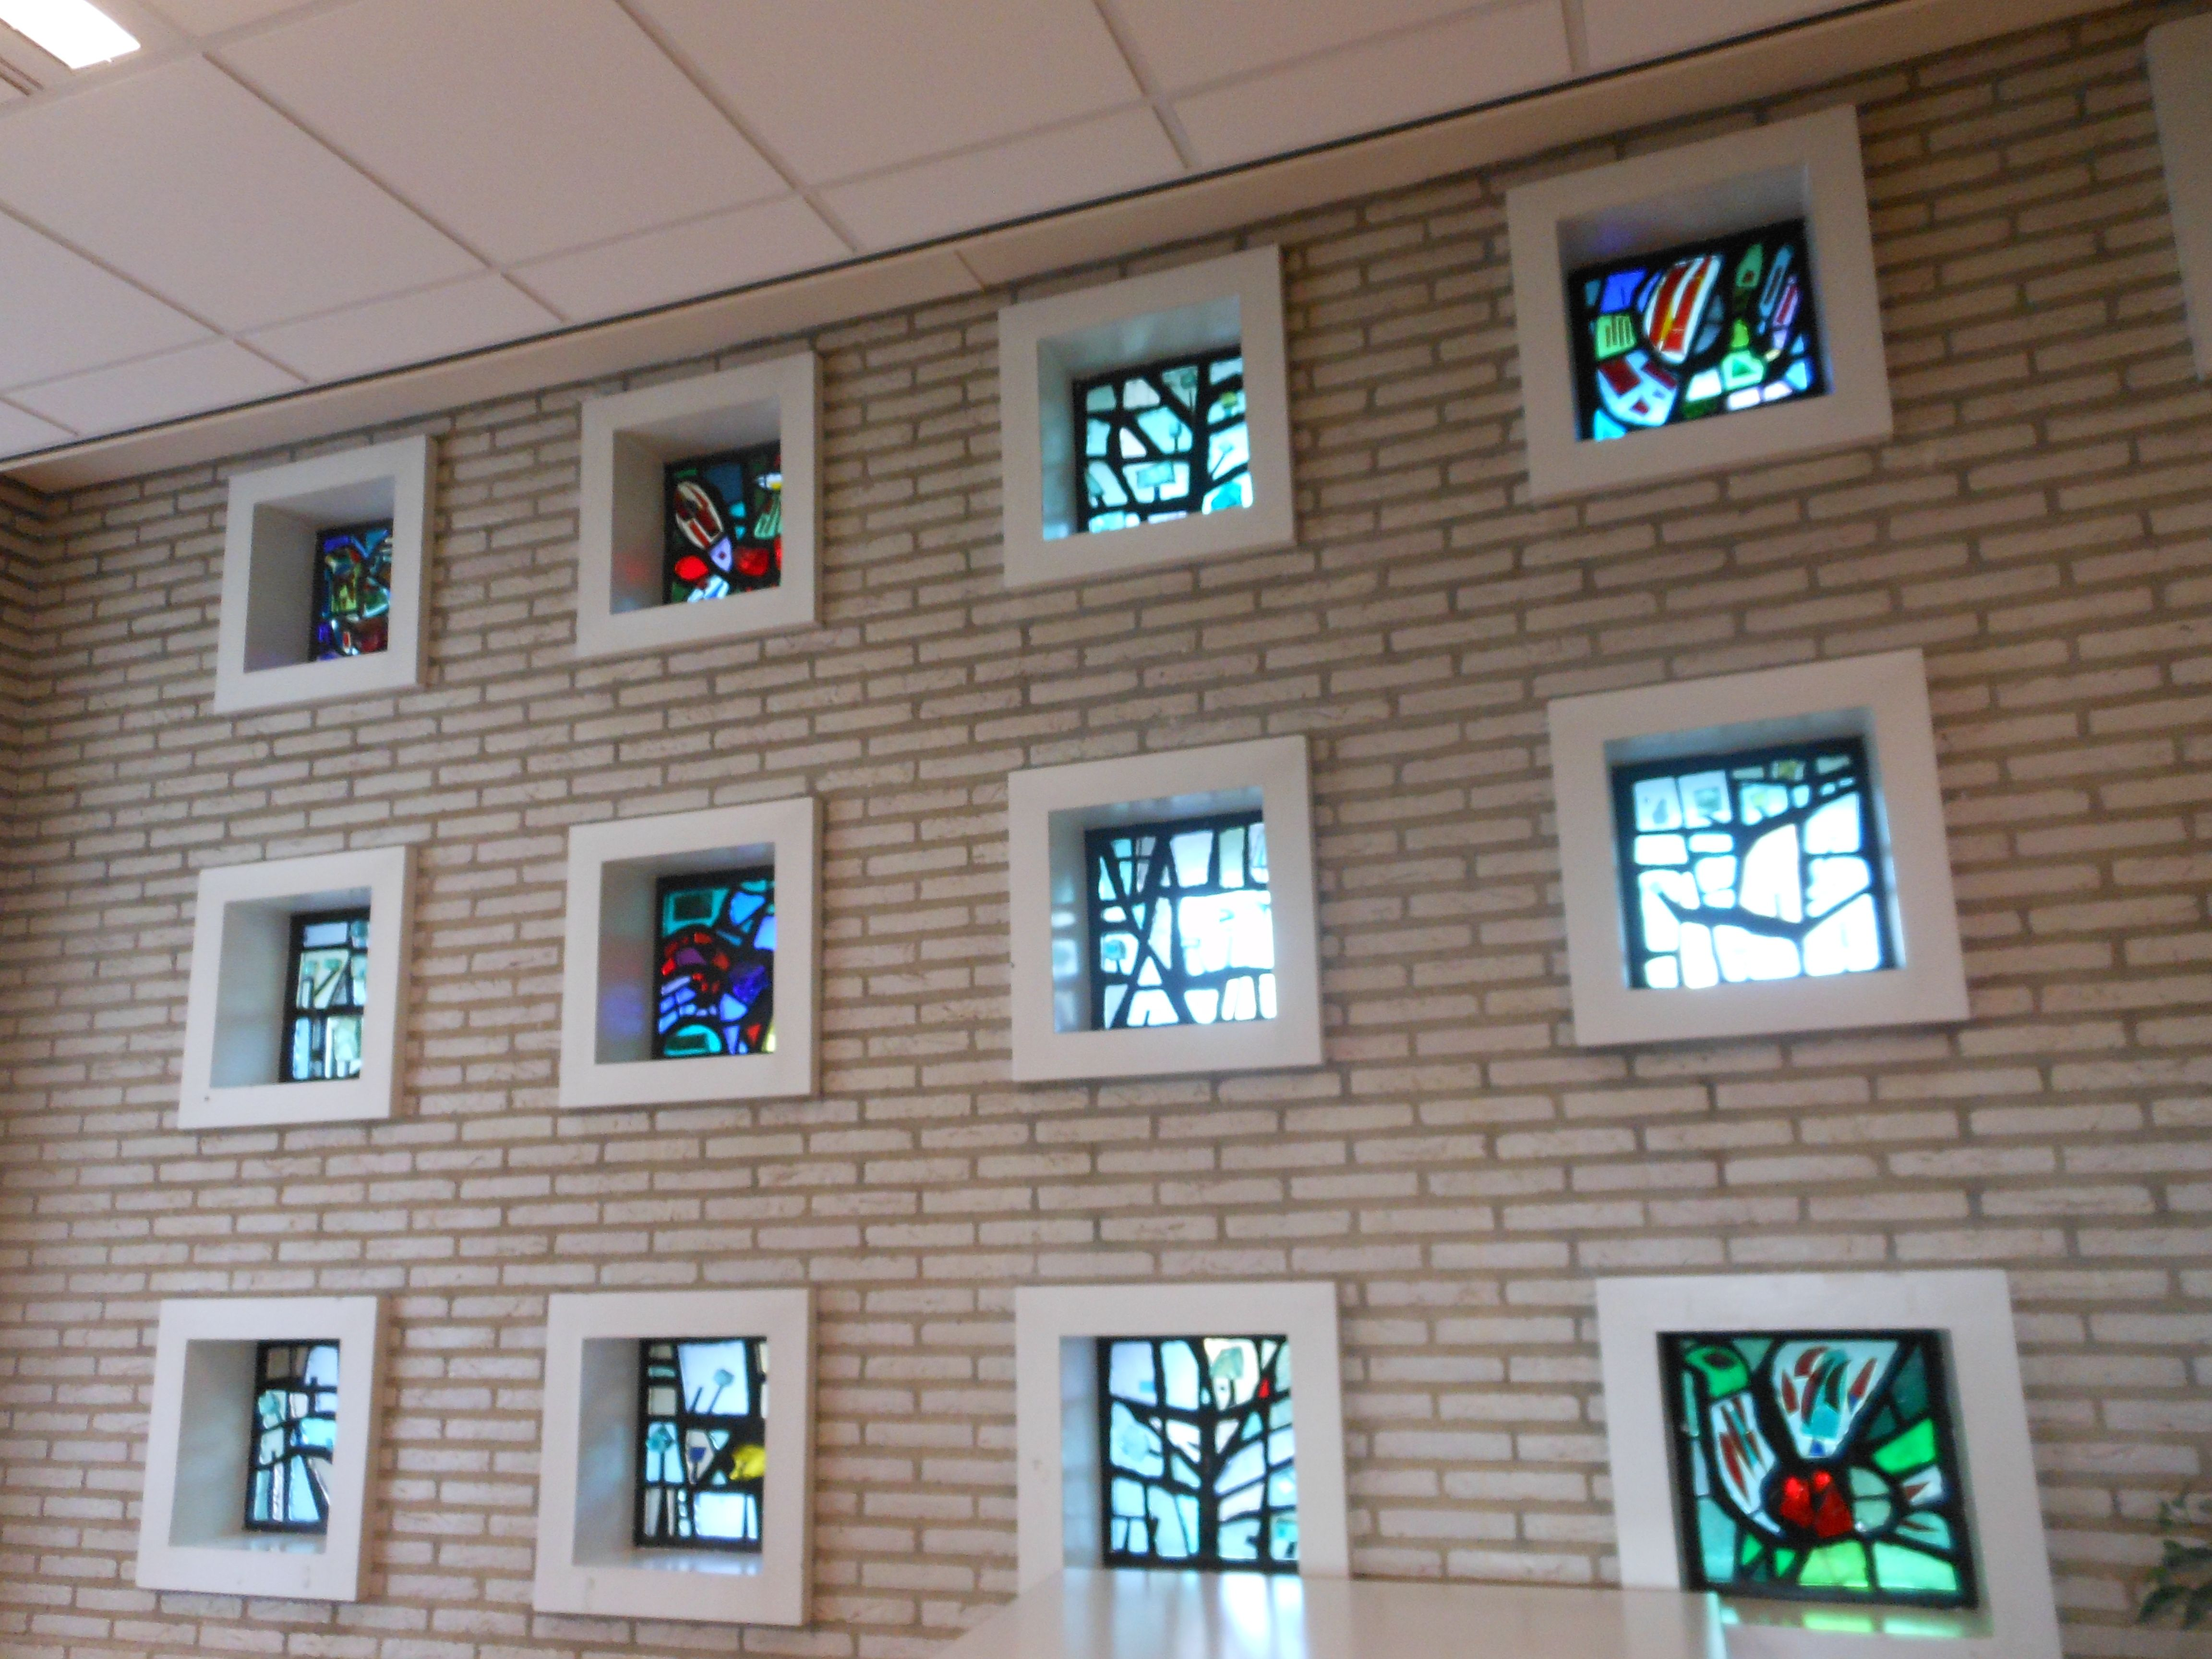 Stained Glass At University Of Groningen Holland Glas In Lood At Rijksuniversiteit Groningen Academybuilding Rug Holland Vitrail Colorier Peinture Sur Verre